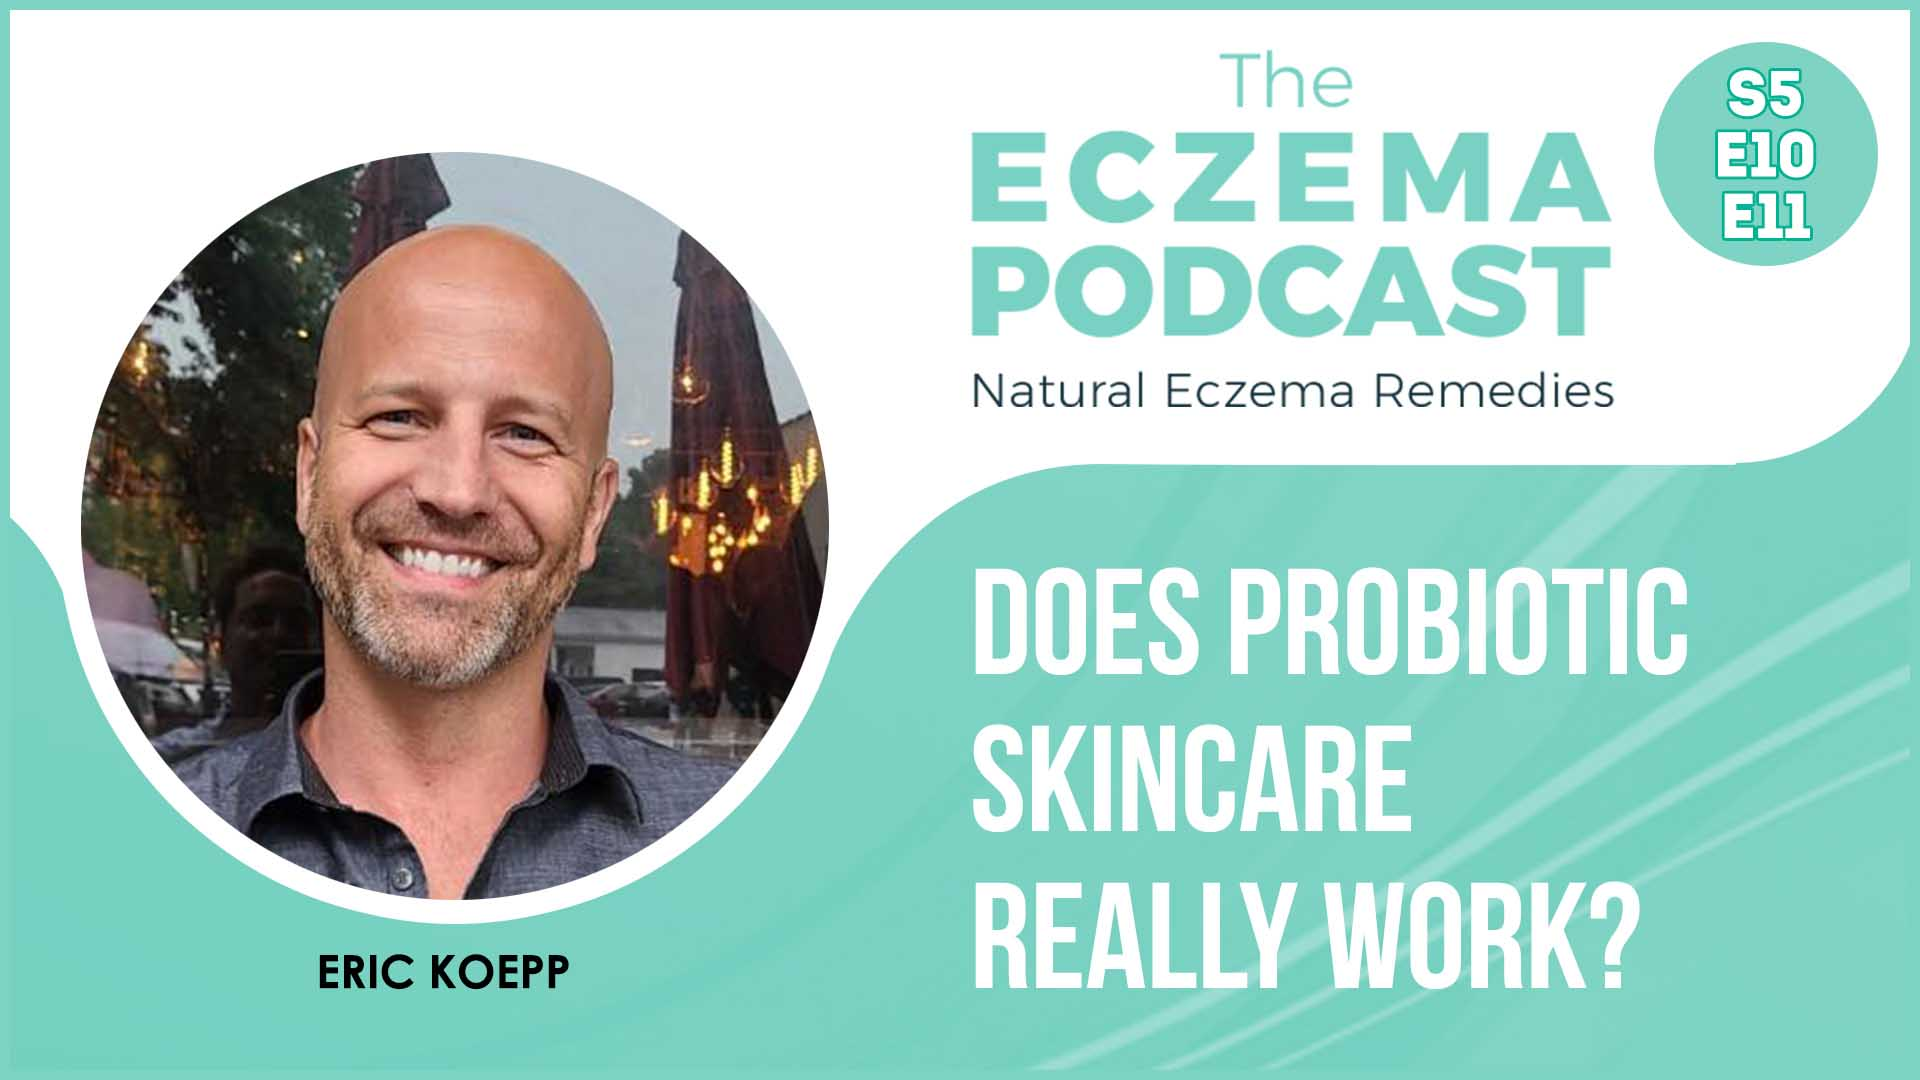 probiotic skincare for eczema